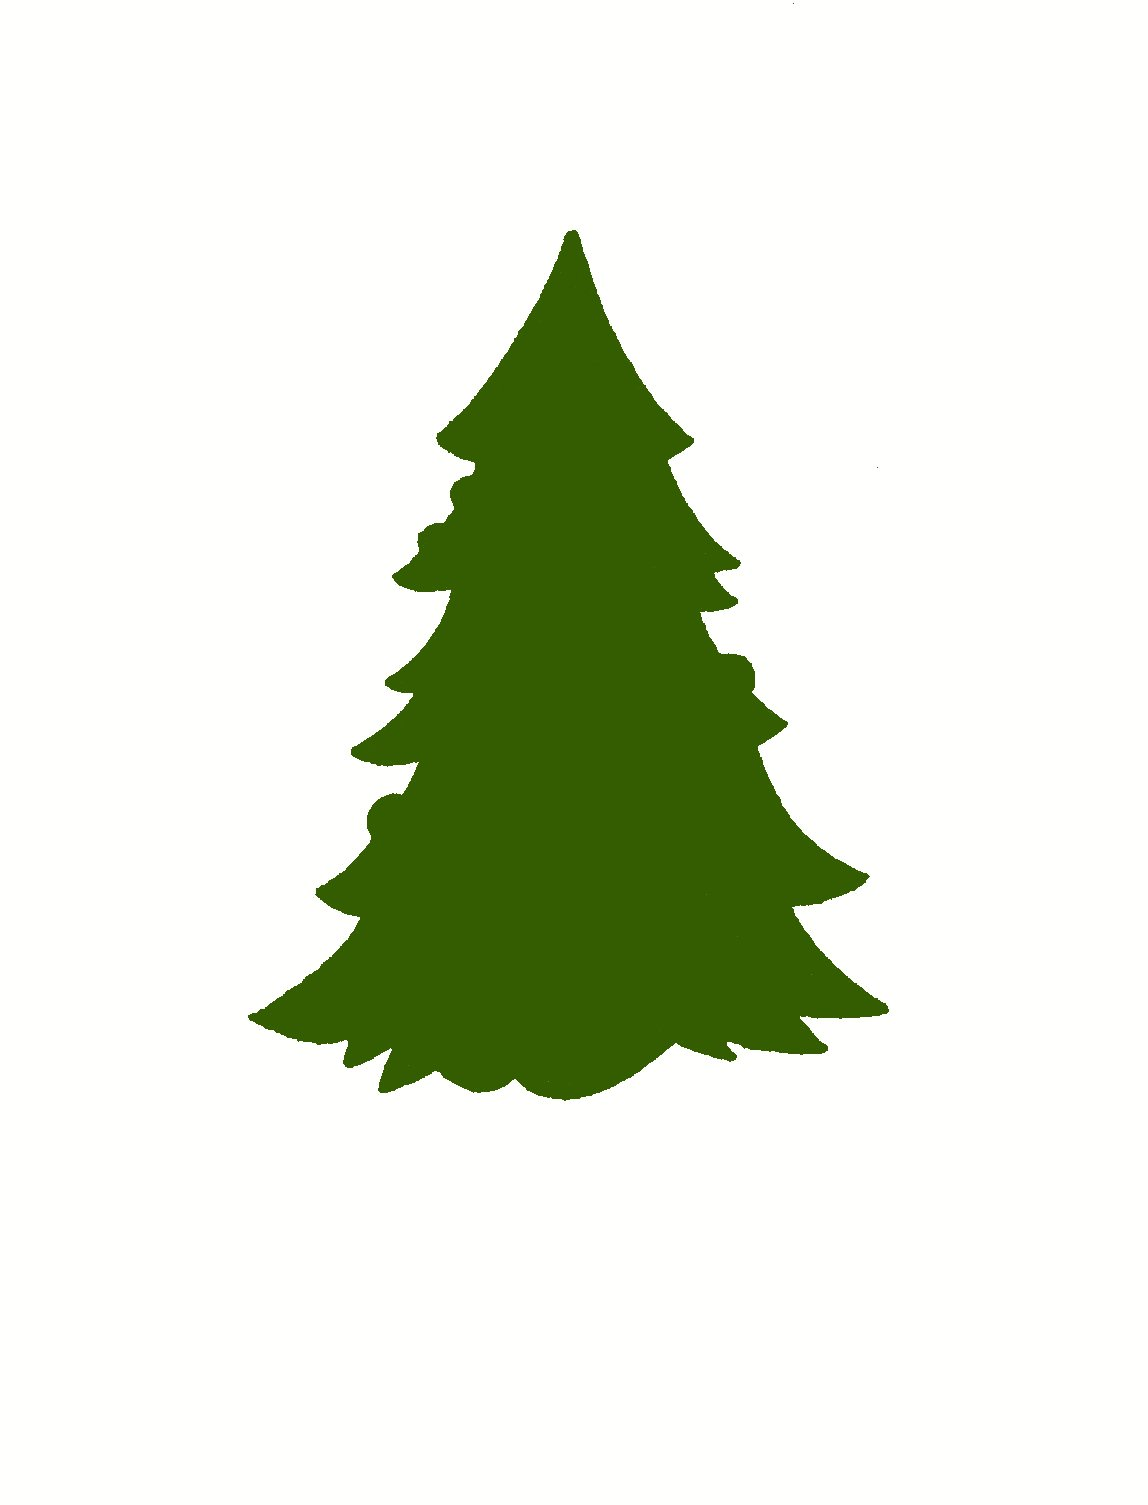 Evergreen Tree Vector - ClipArt Best